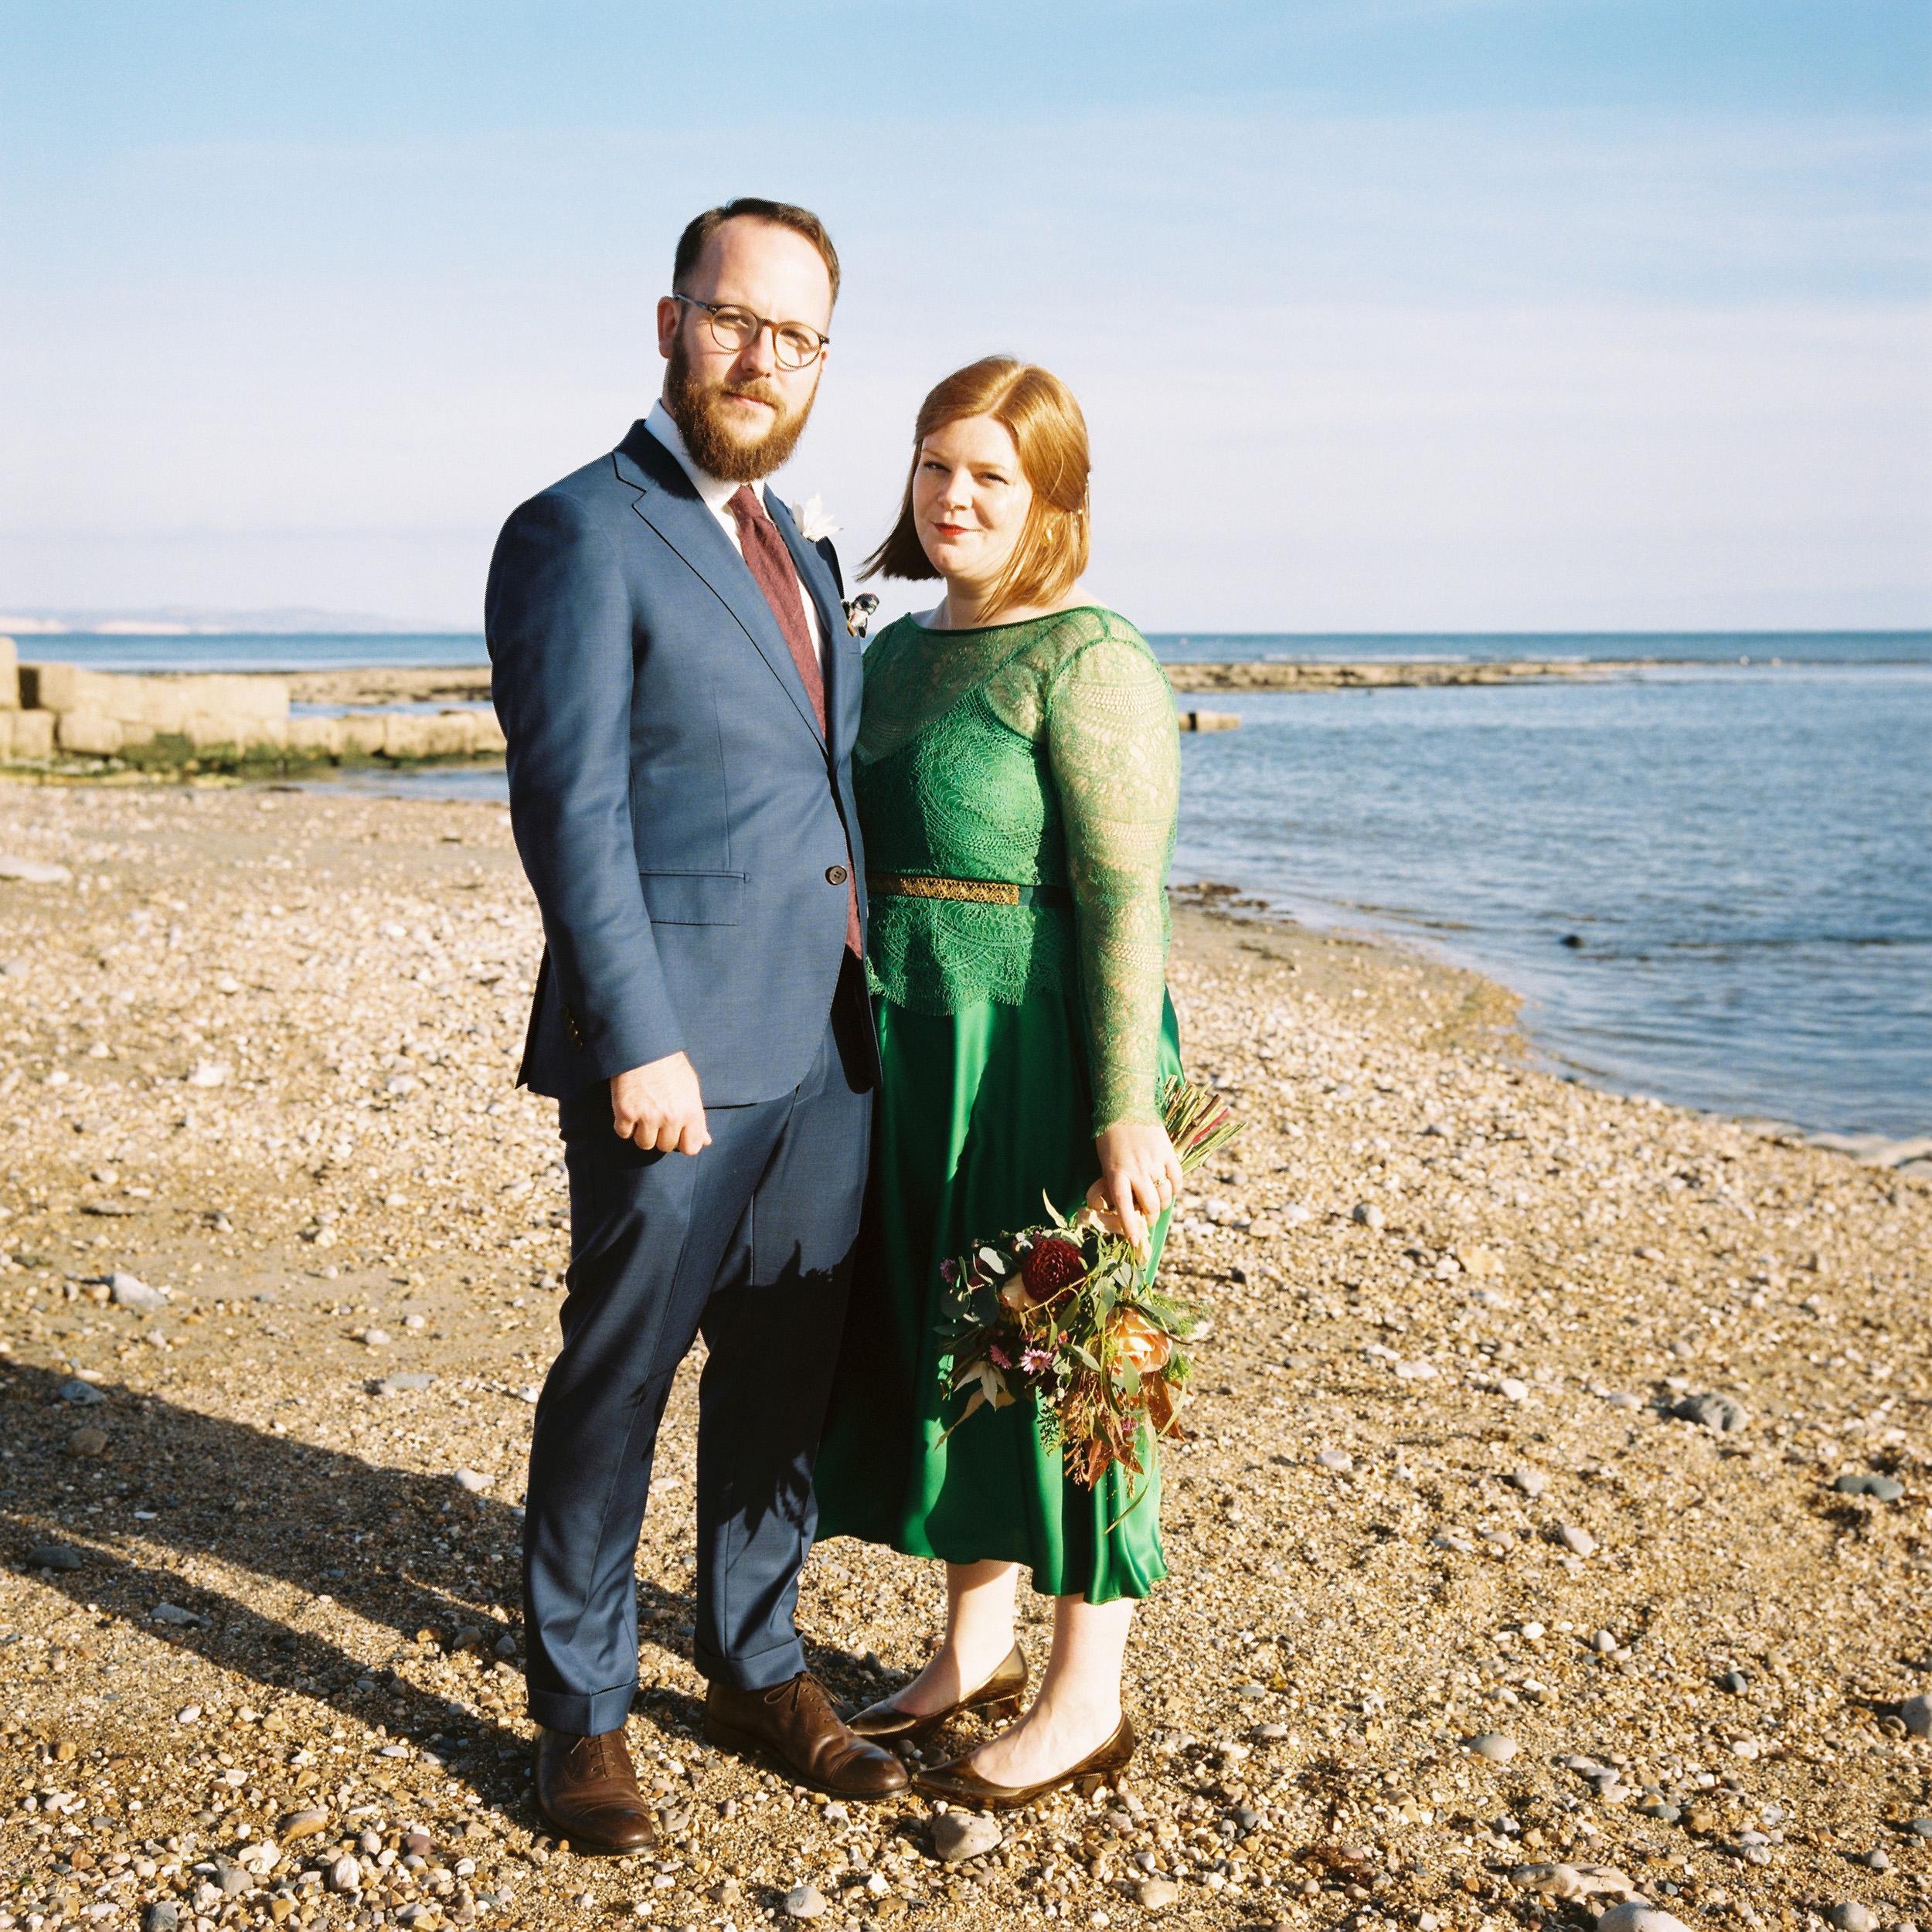 Lucy-Bespoke-Green-Silk-Lace-Wedding-Dress-Kate-Beaumont-Sheffield-5.jpg